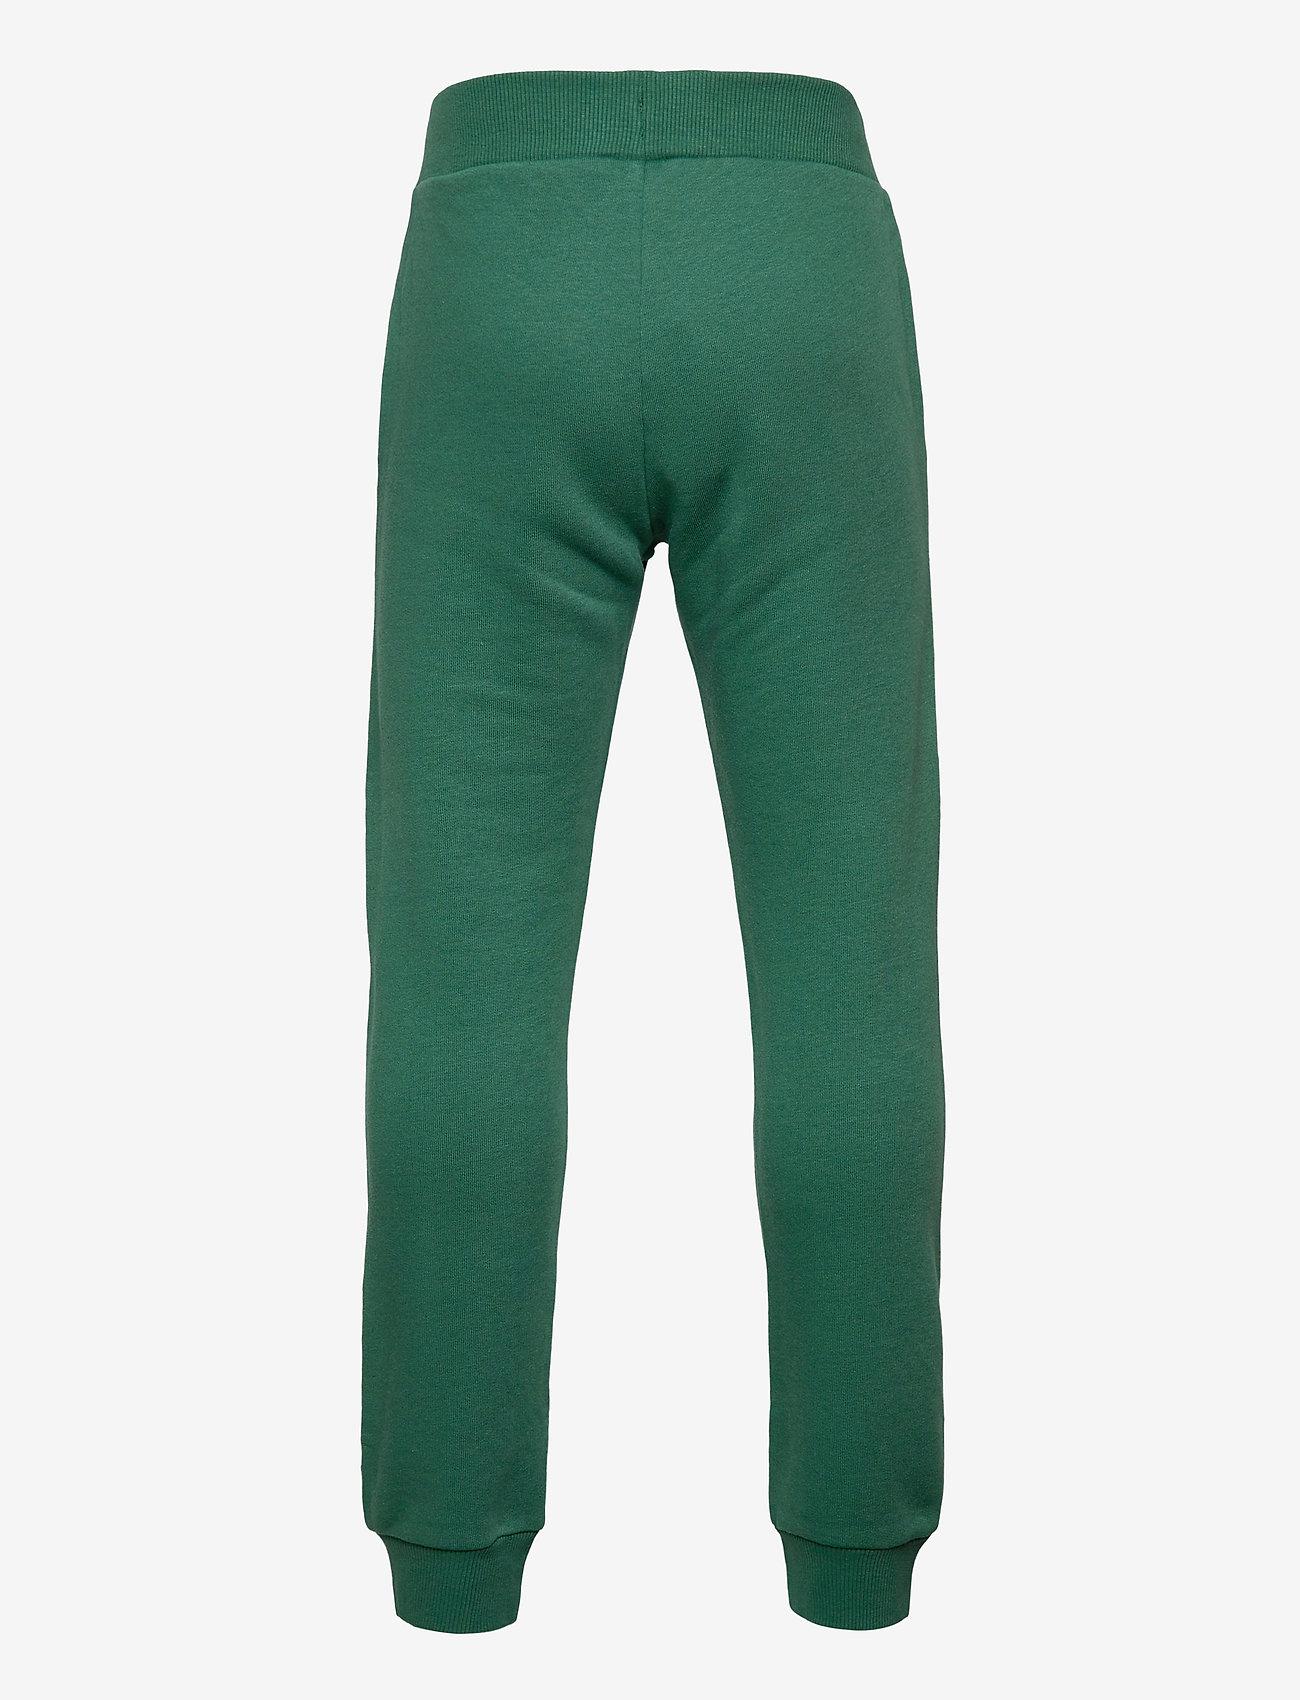 Trousers Jogging Basic Fashion (Green) (14.99 €) - Lindex PF7pZ